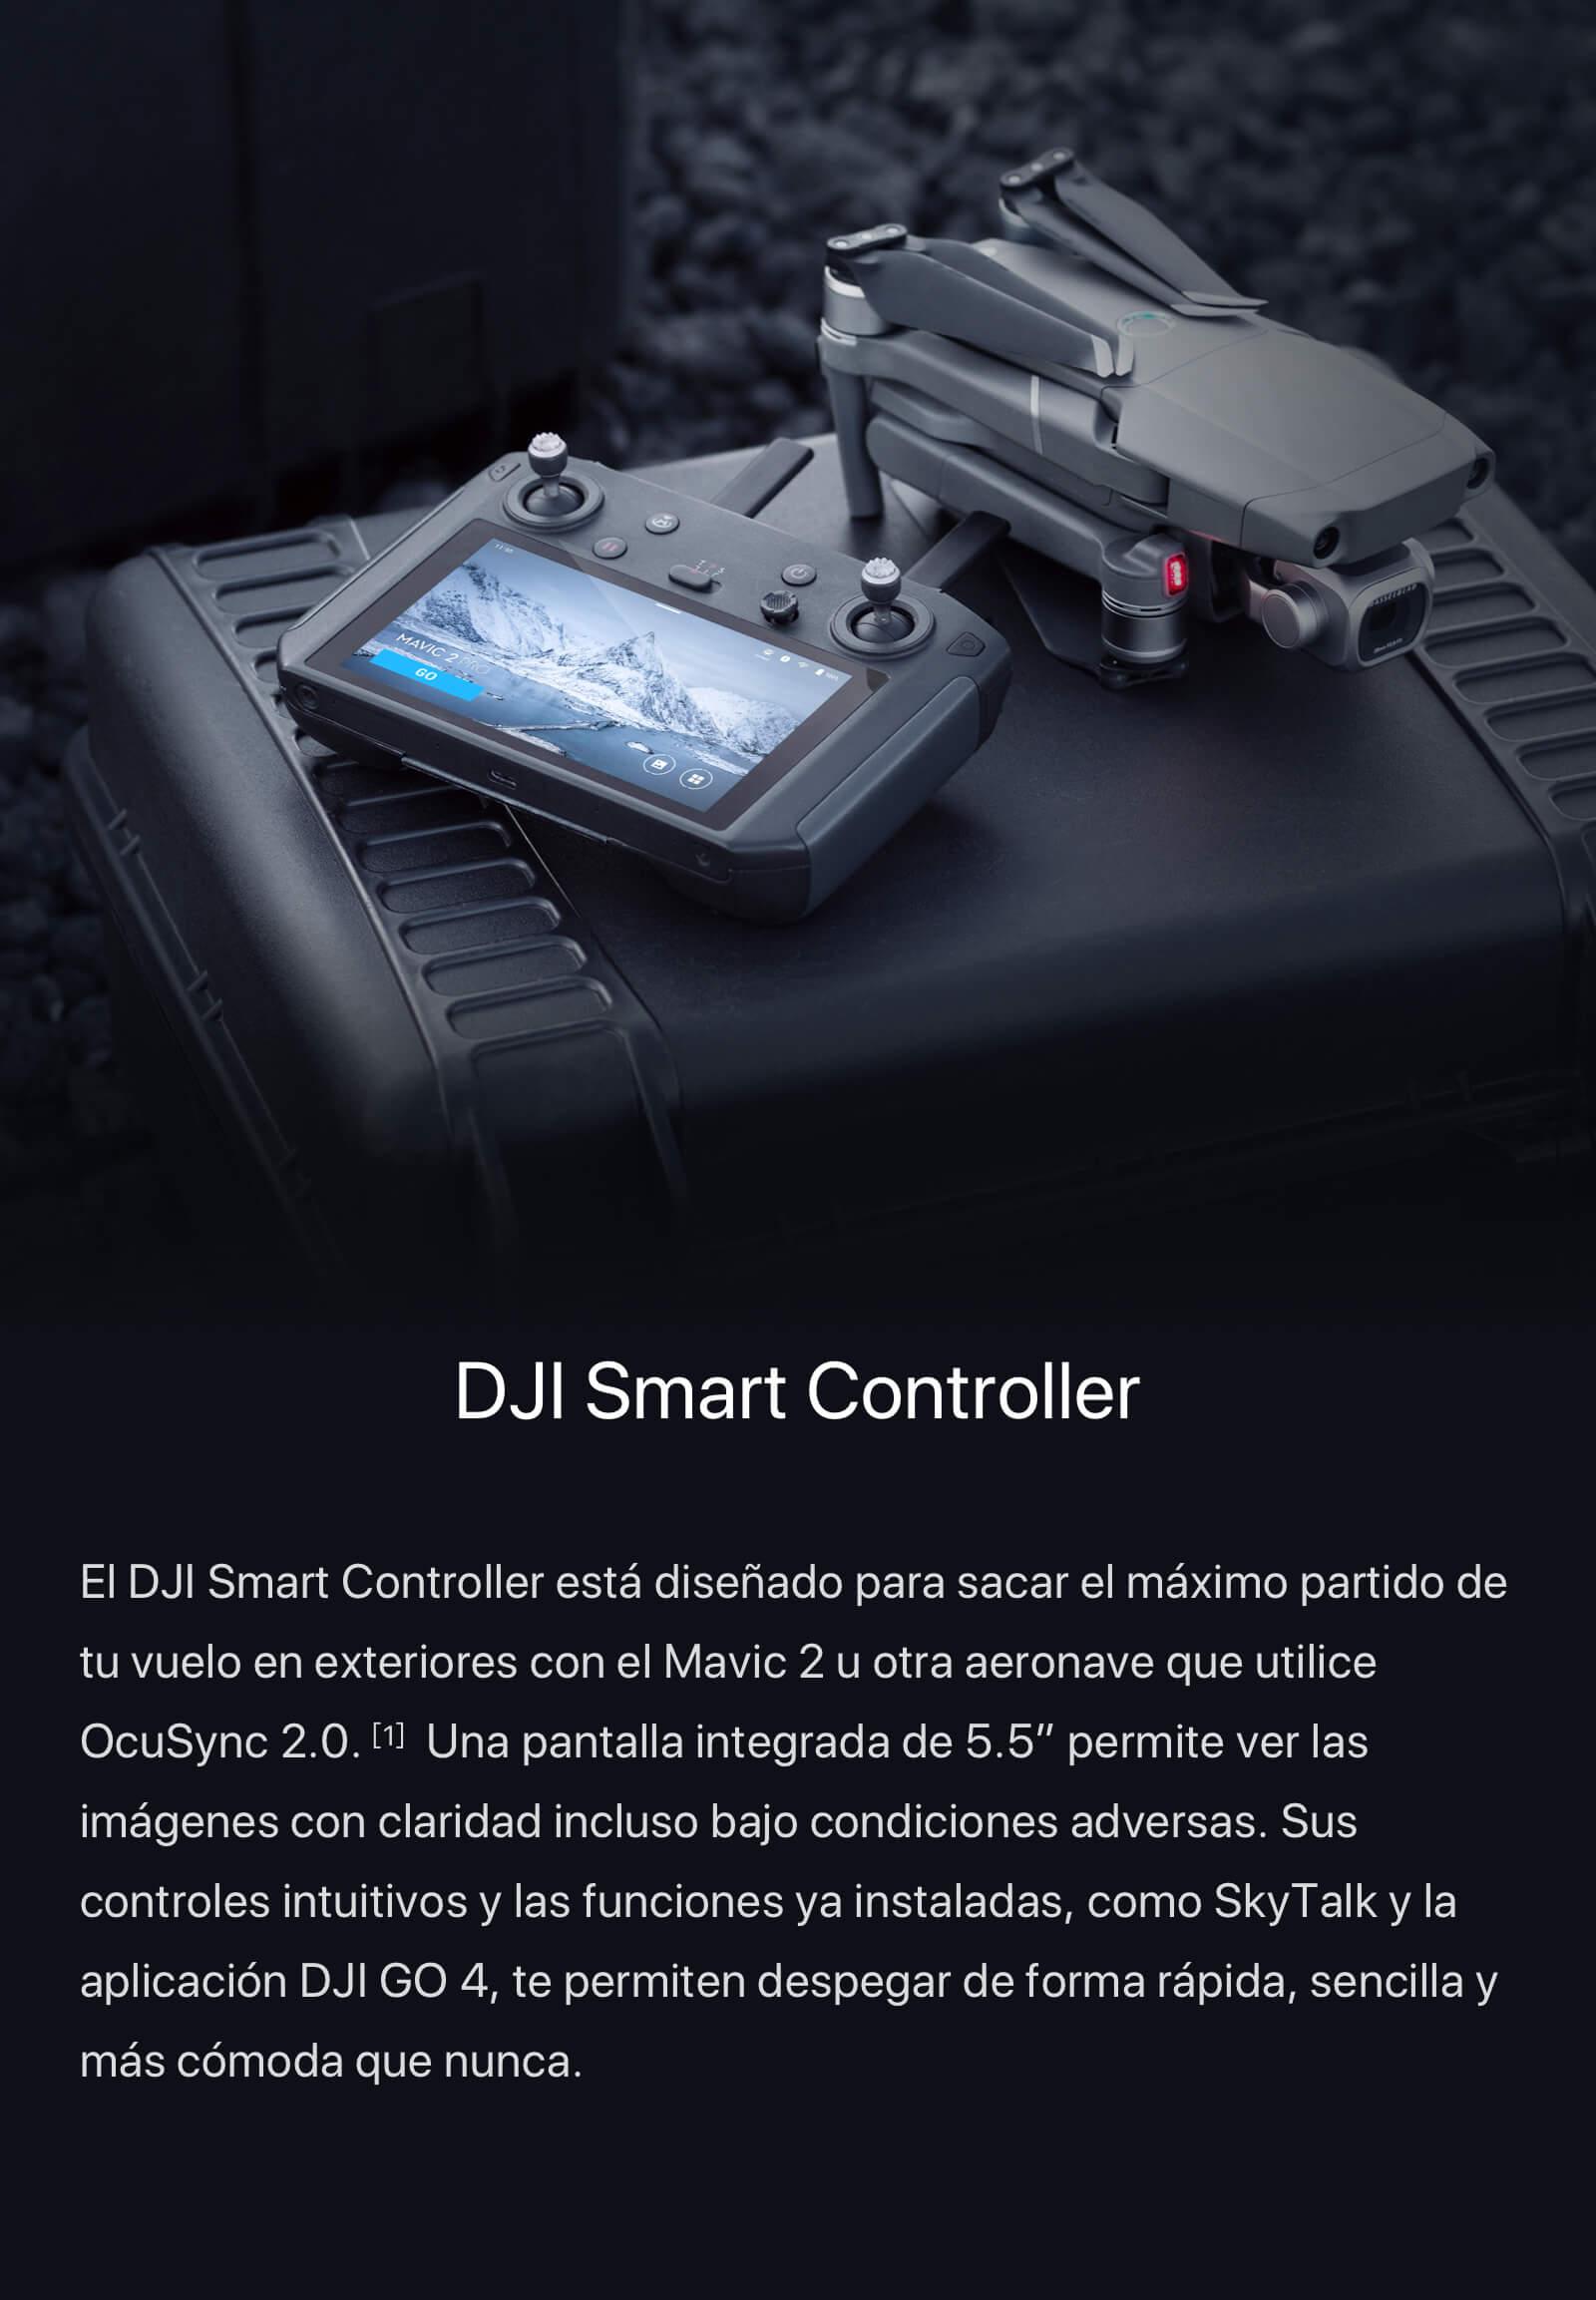 dji_smart_controller_stockrc